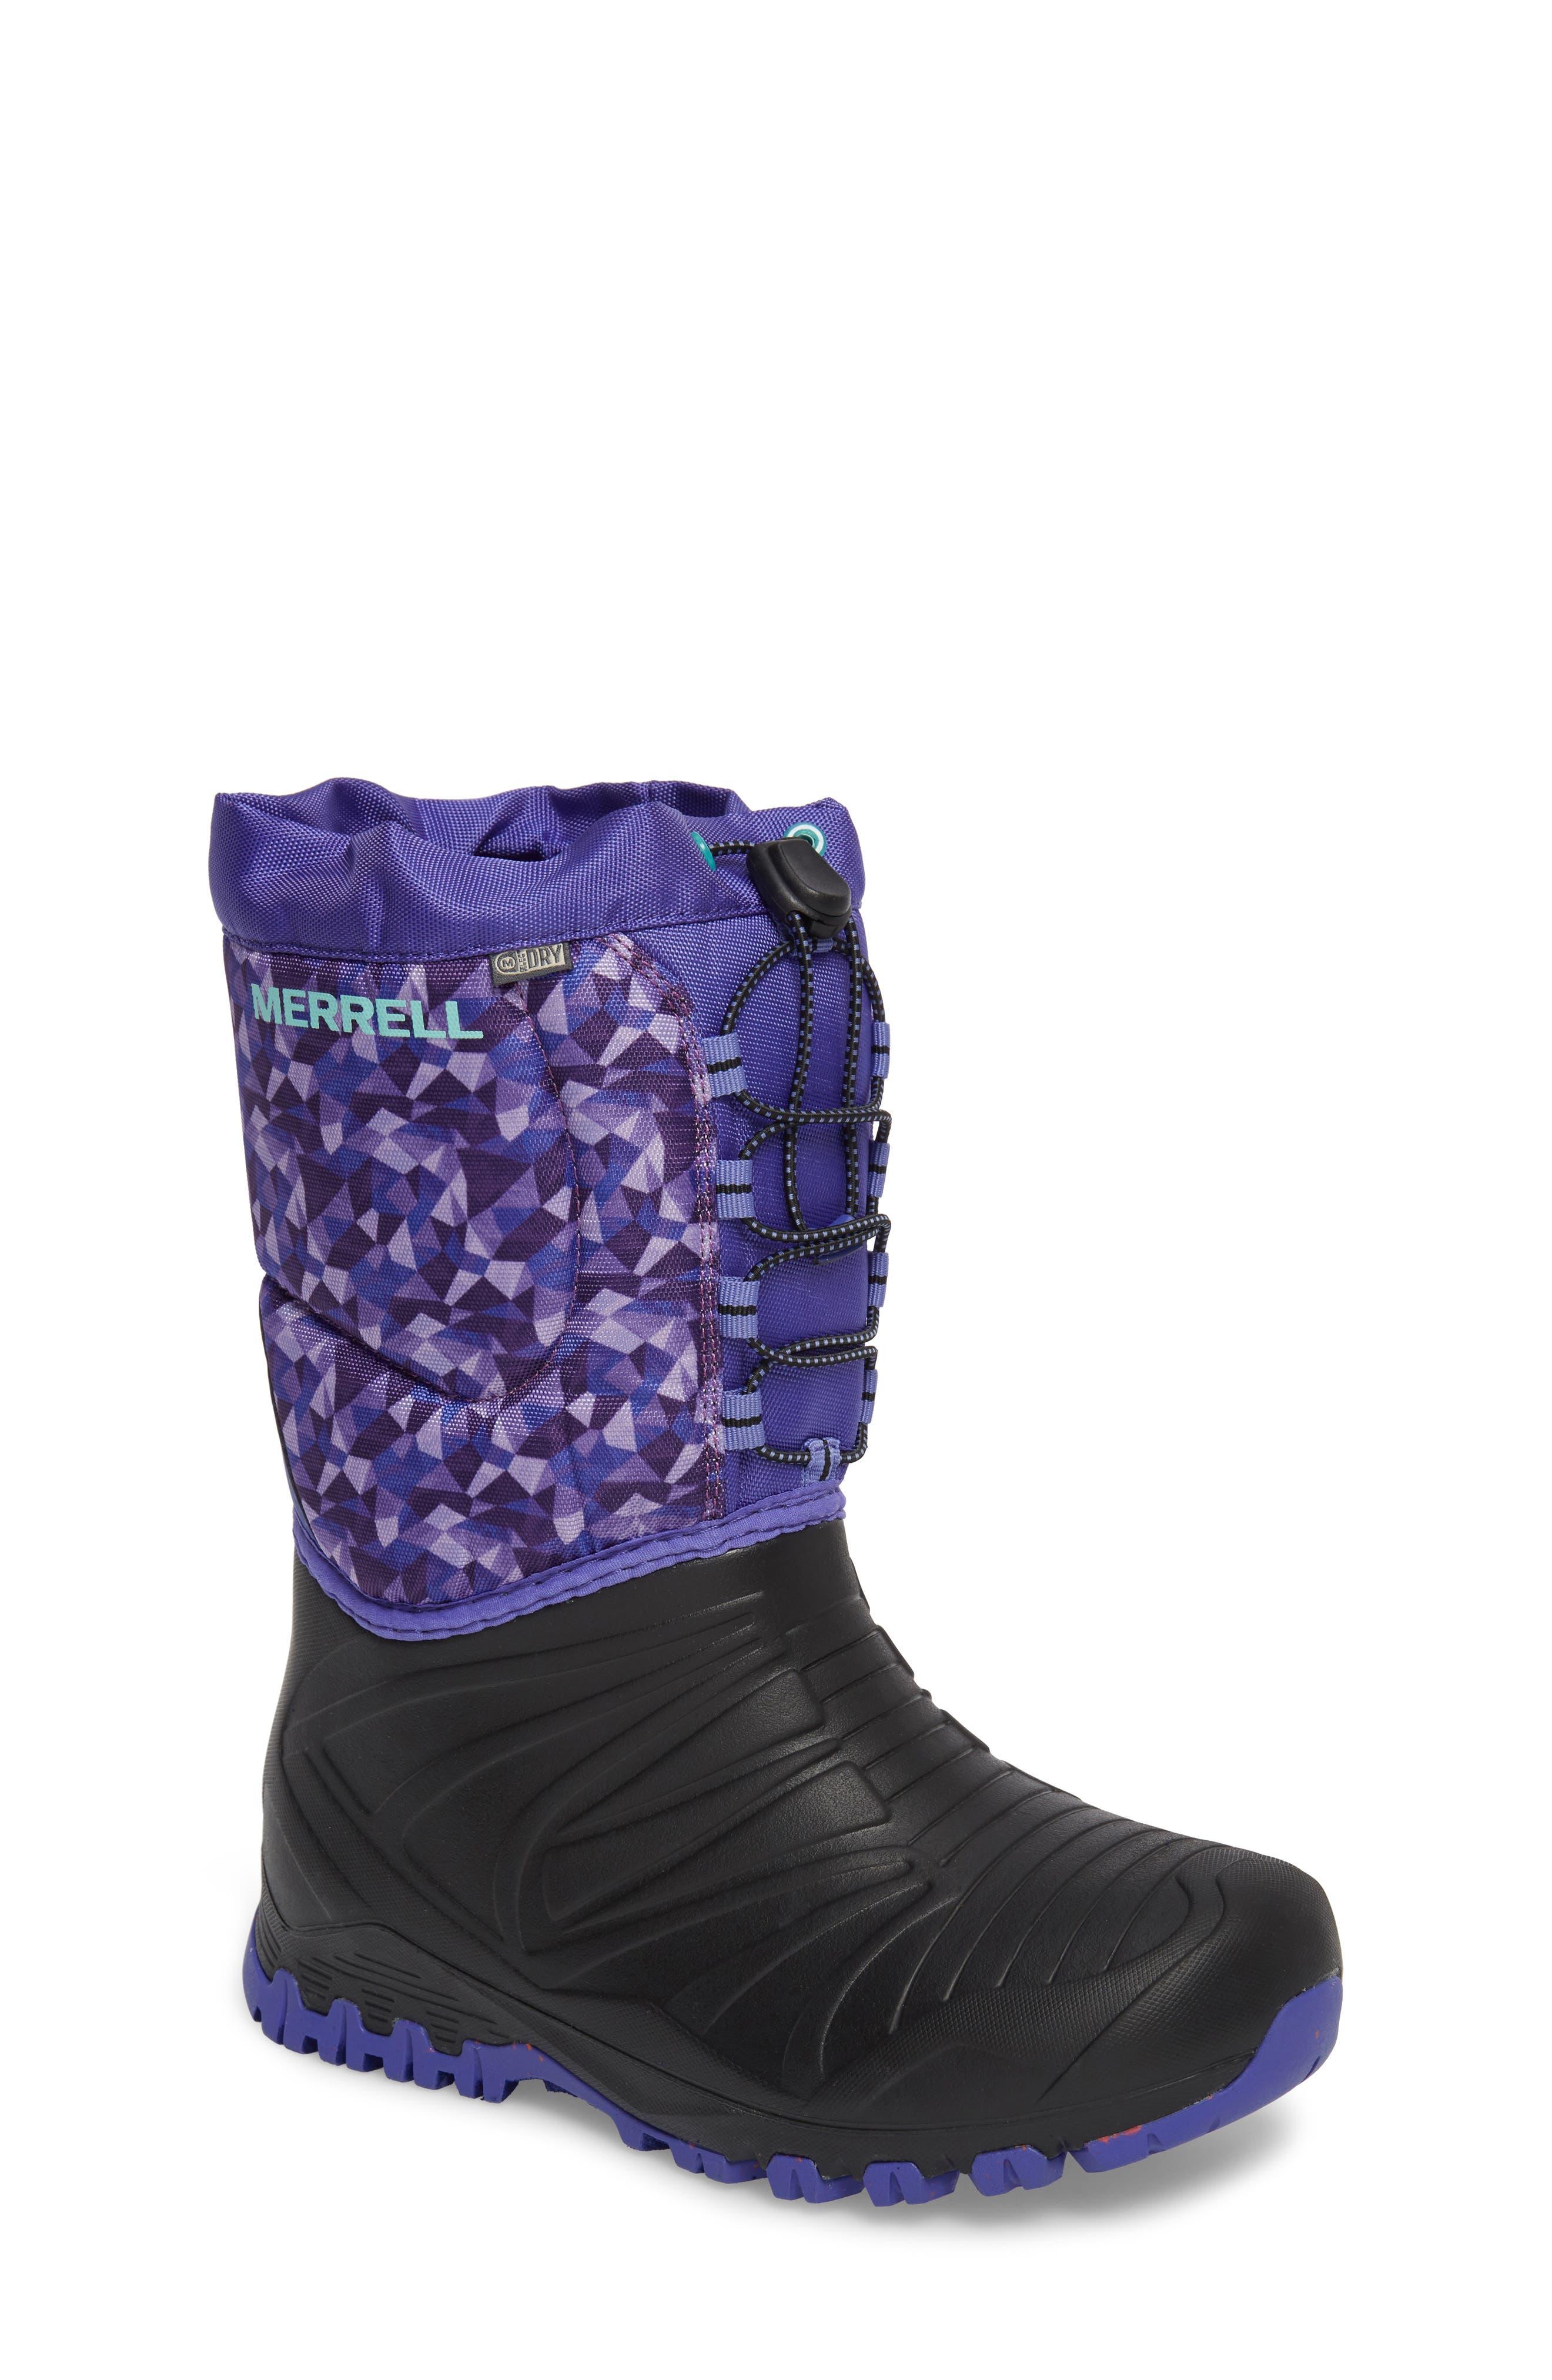 Snow Quest Lite Waterproof Boot,                             Main thumbnail 1, color,                             002